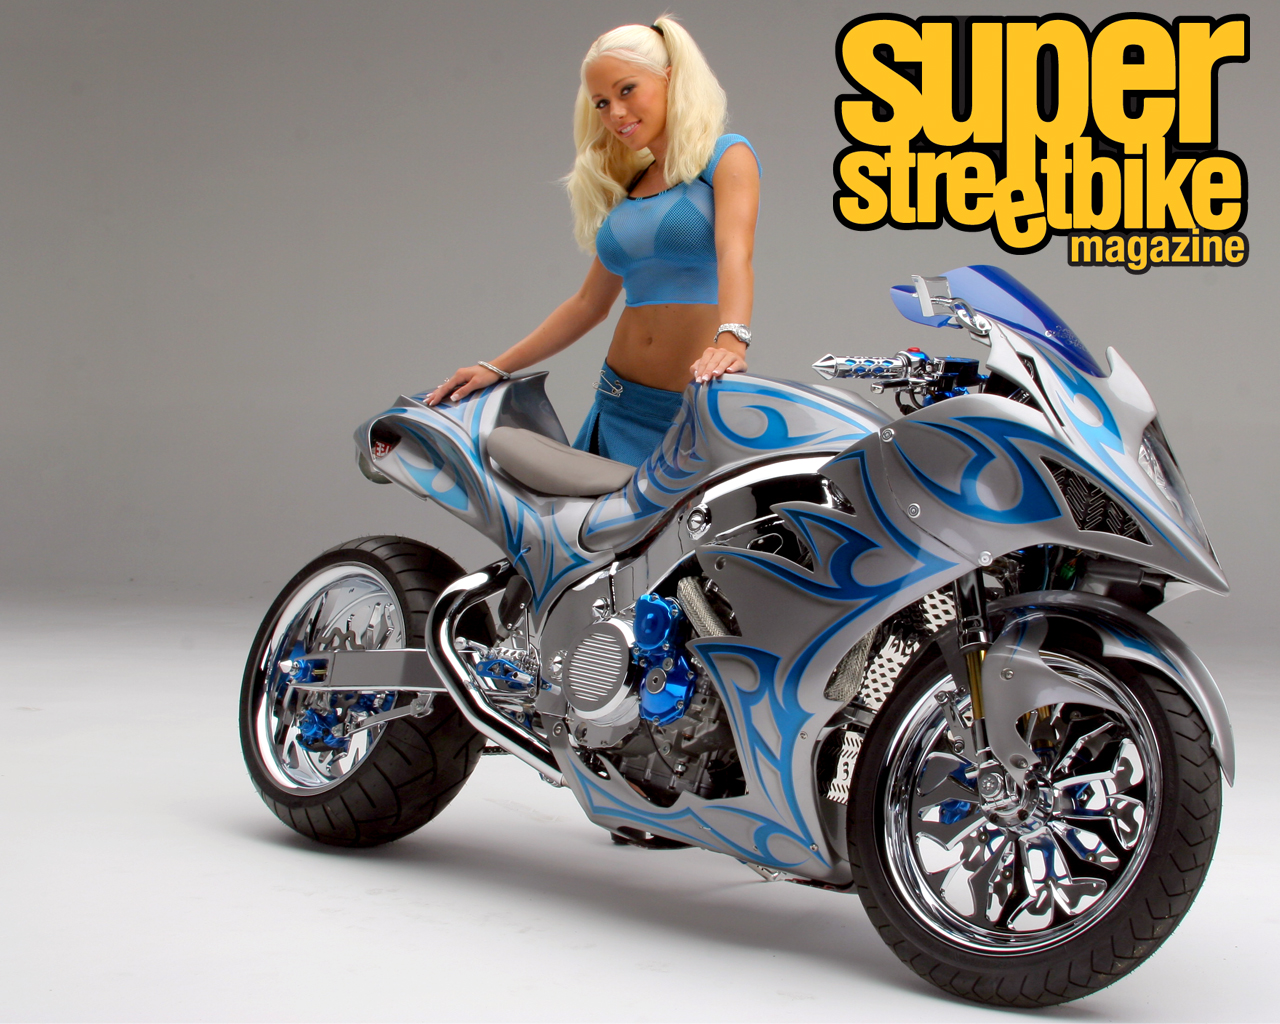 http://4.bp.blogspot.com/-fZjhG0Fz_Pw/T0c4dwjyKnI/AAAAAAAAAEA/AvnuSZx4ScU/s1600/super_street_bike_wallpaper.jpg